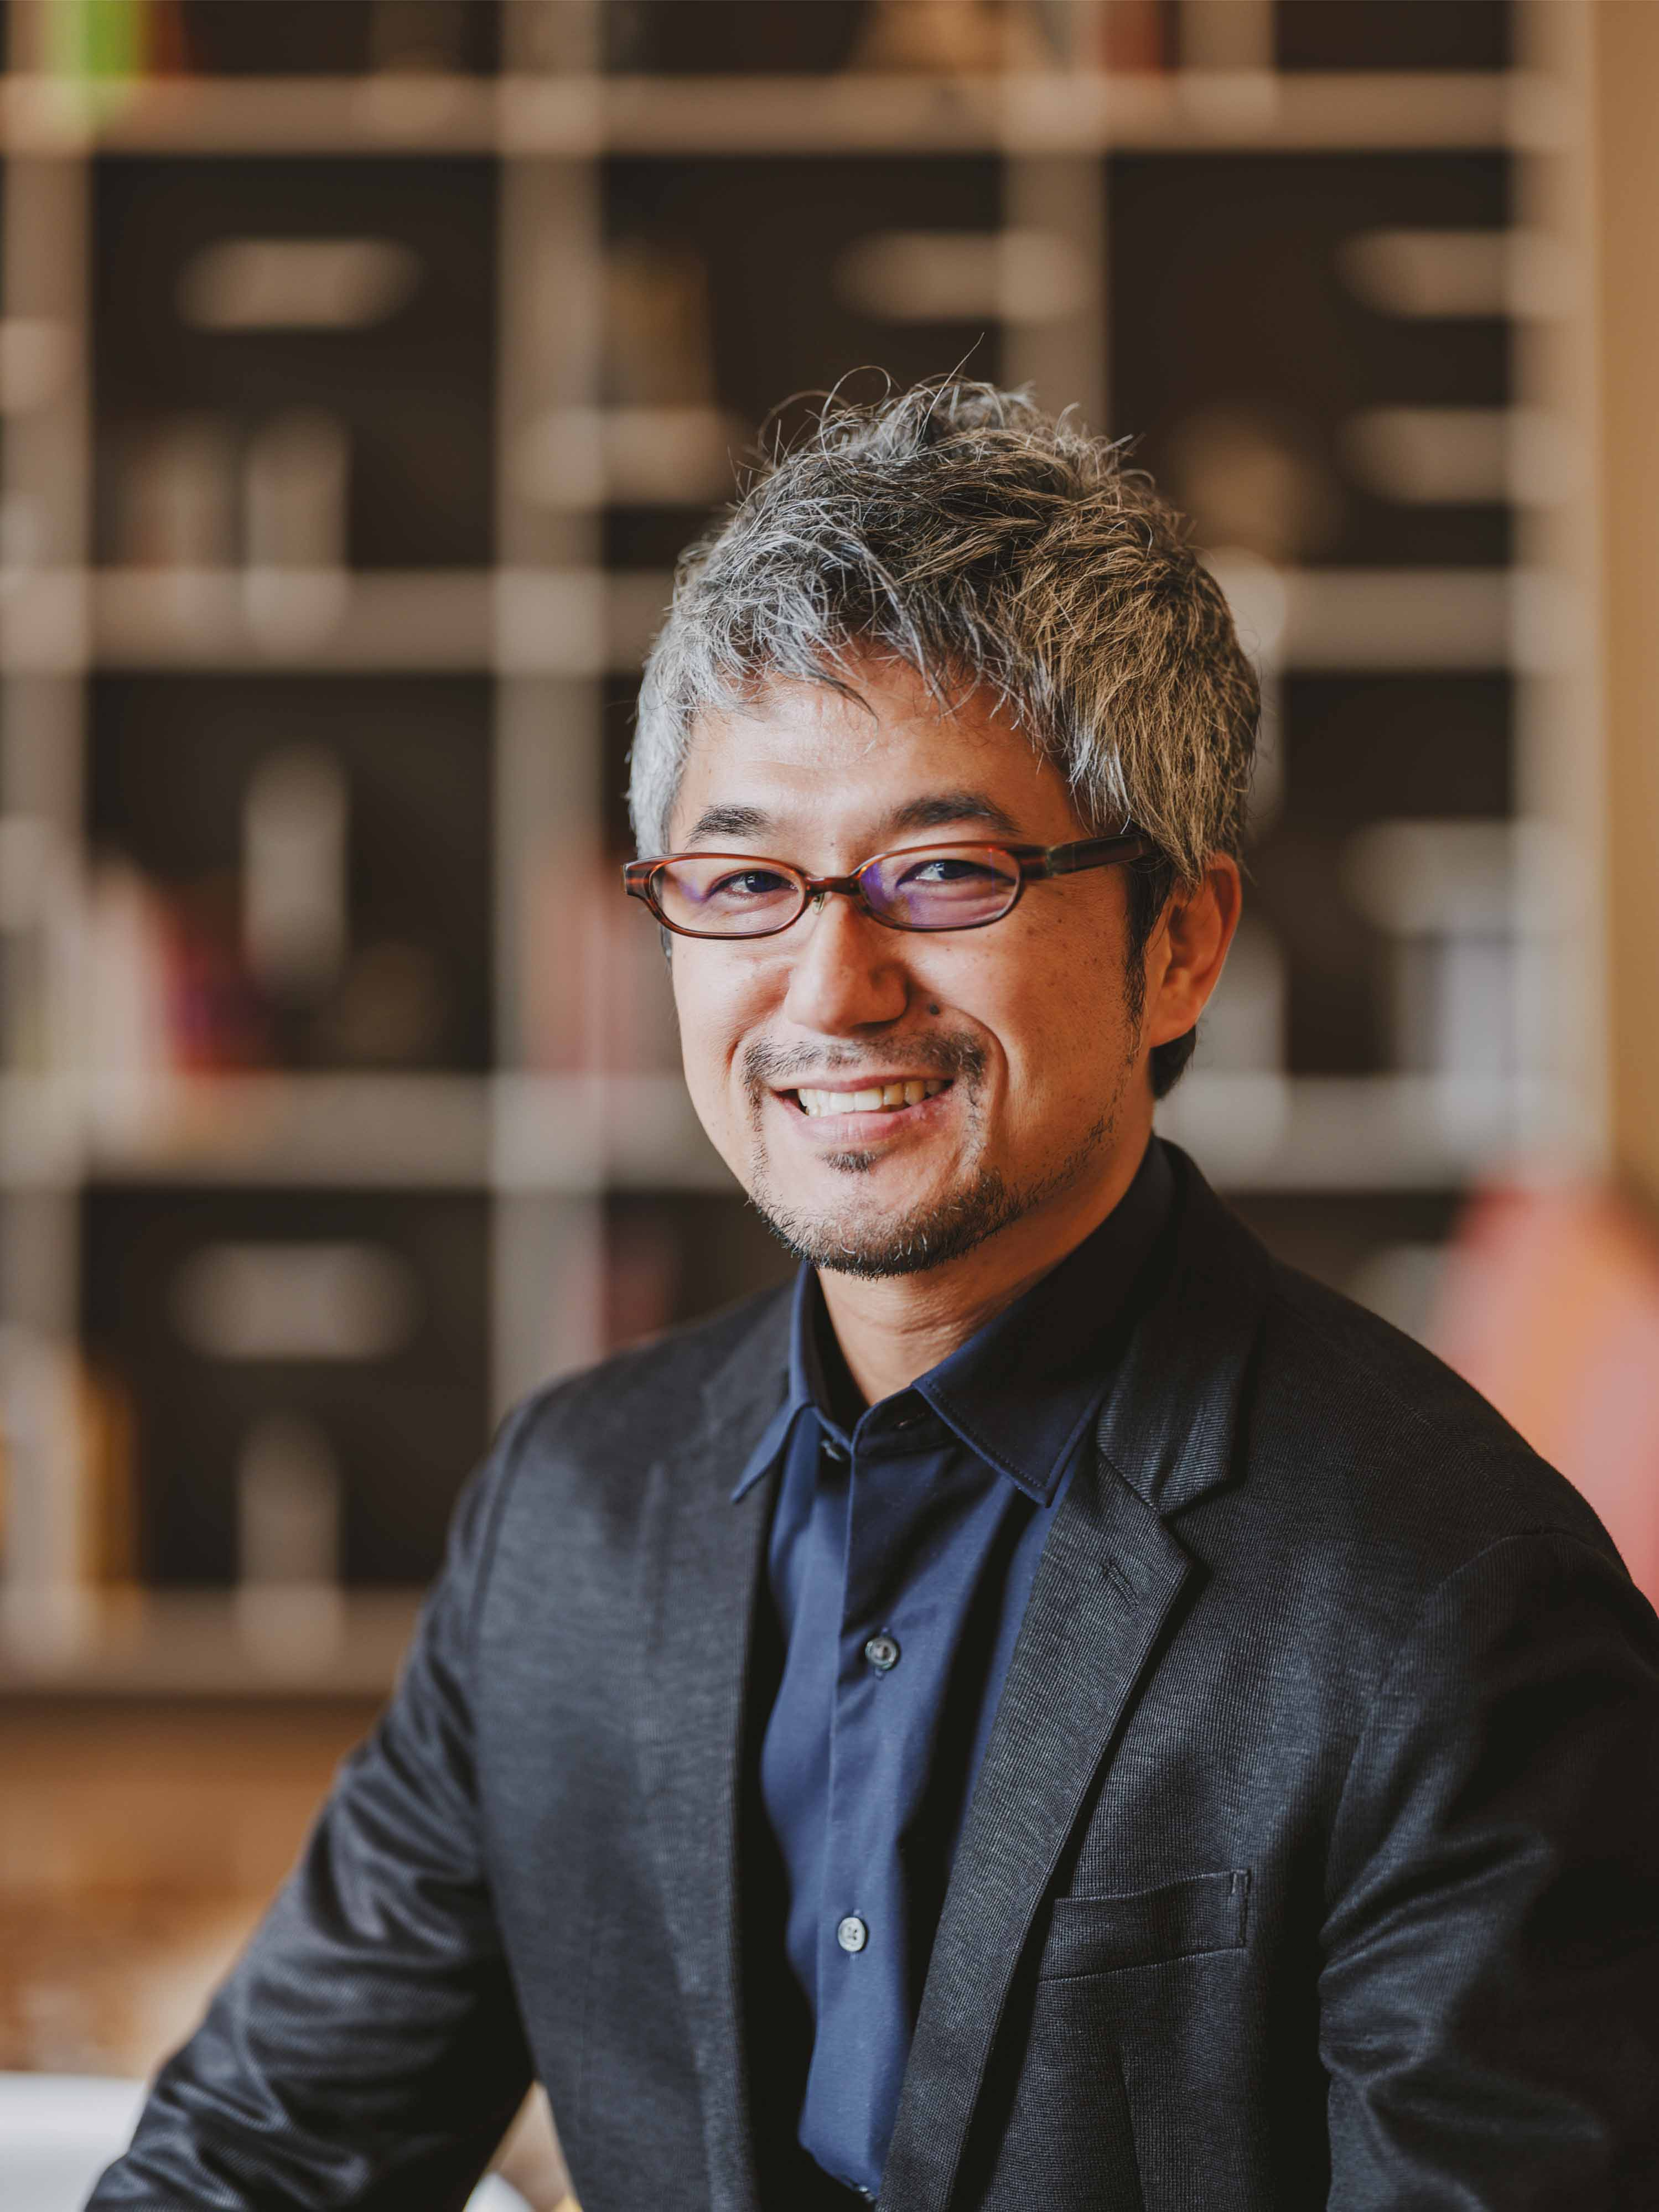 Fujifilm design manager Masazumi Imai